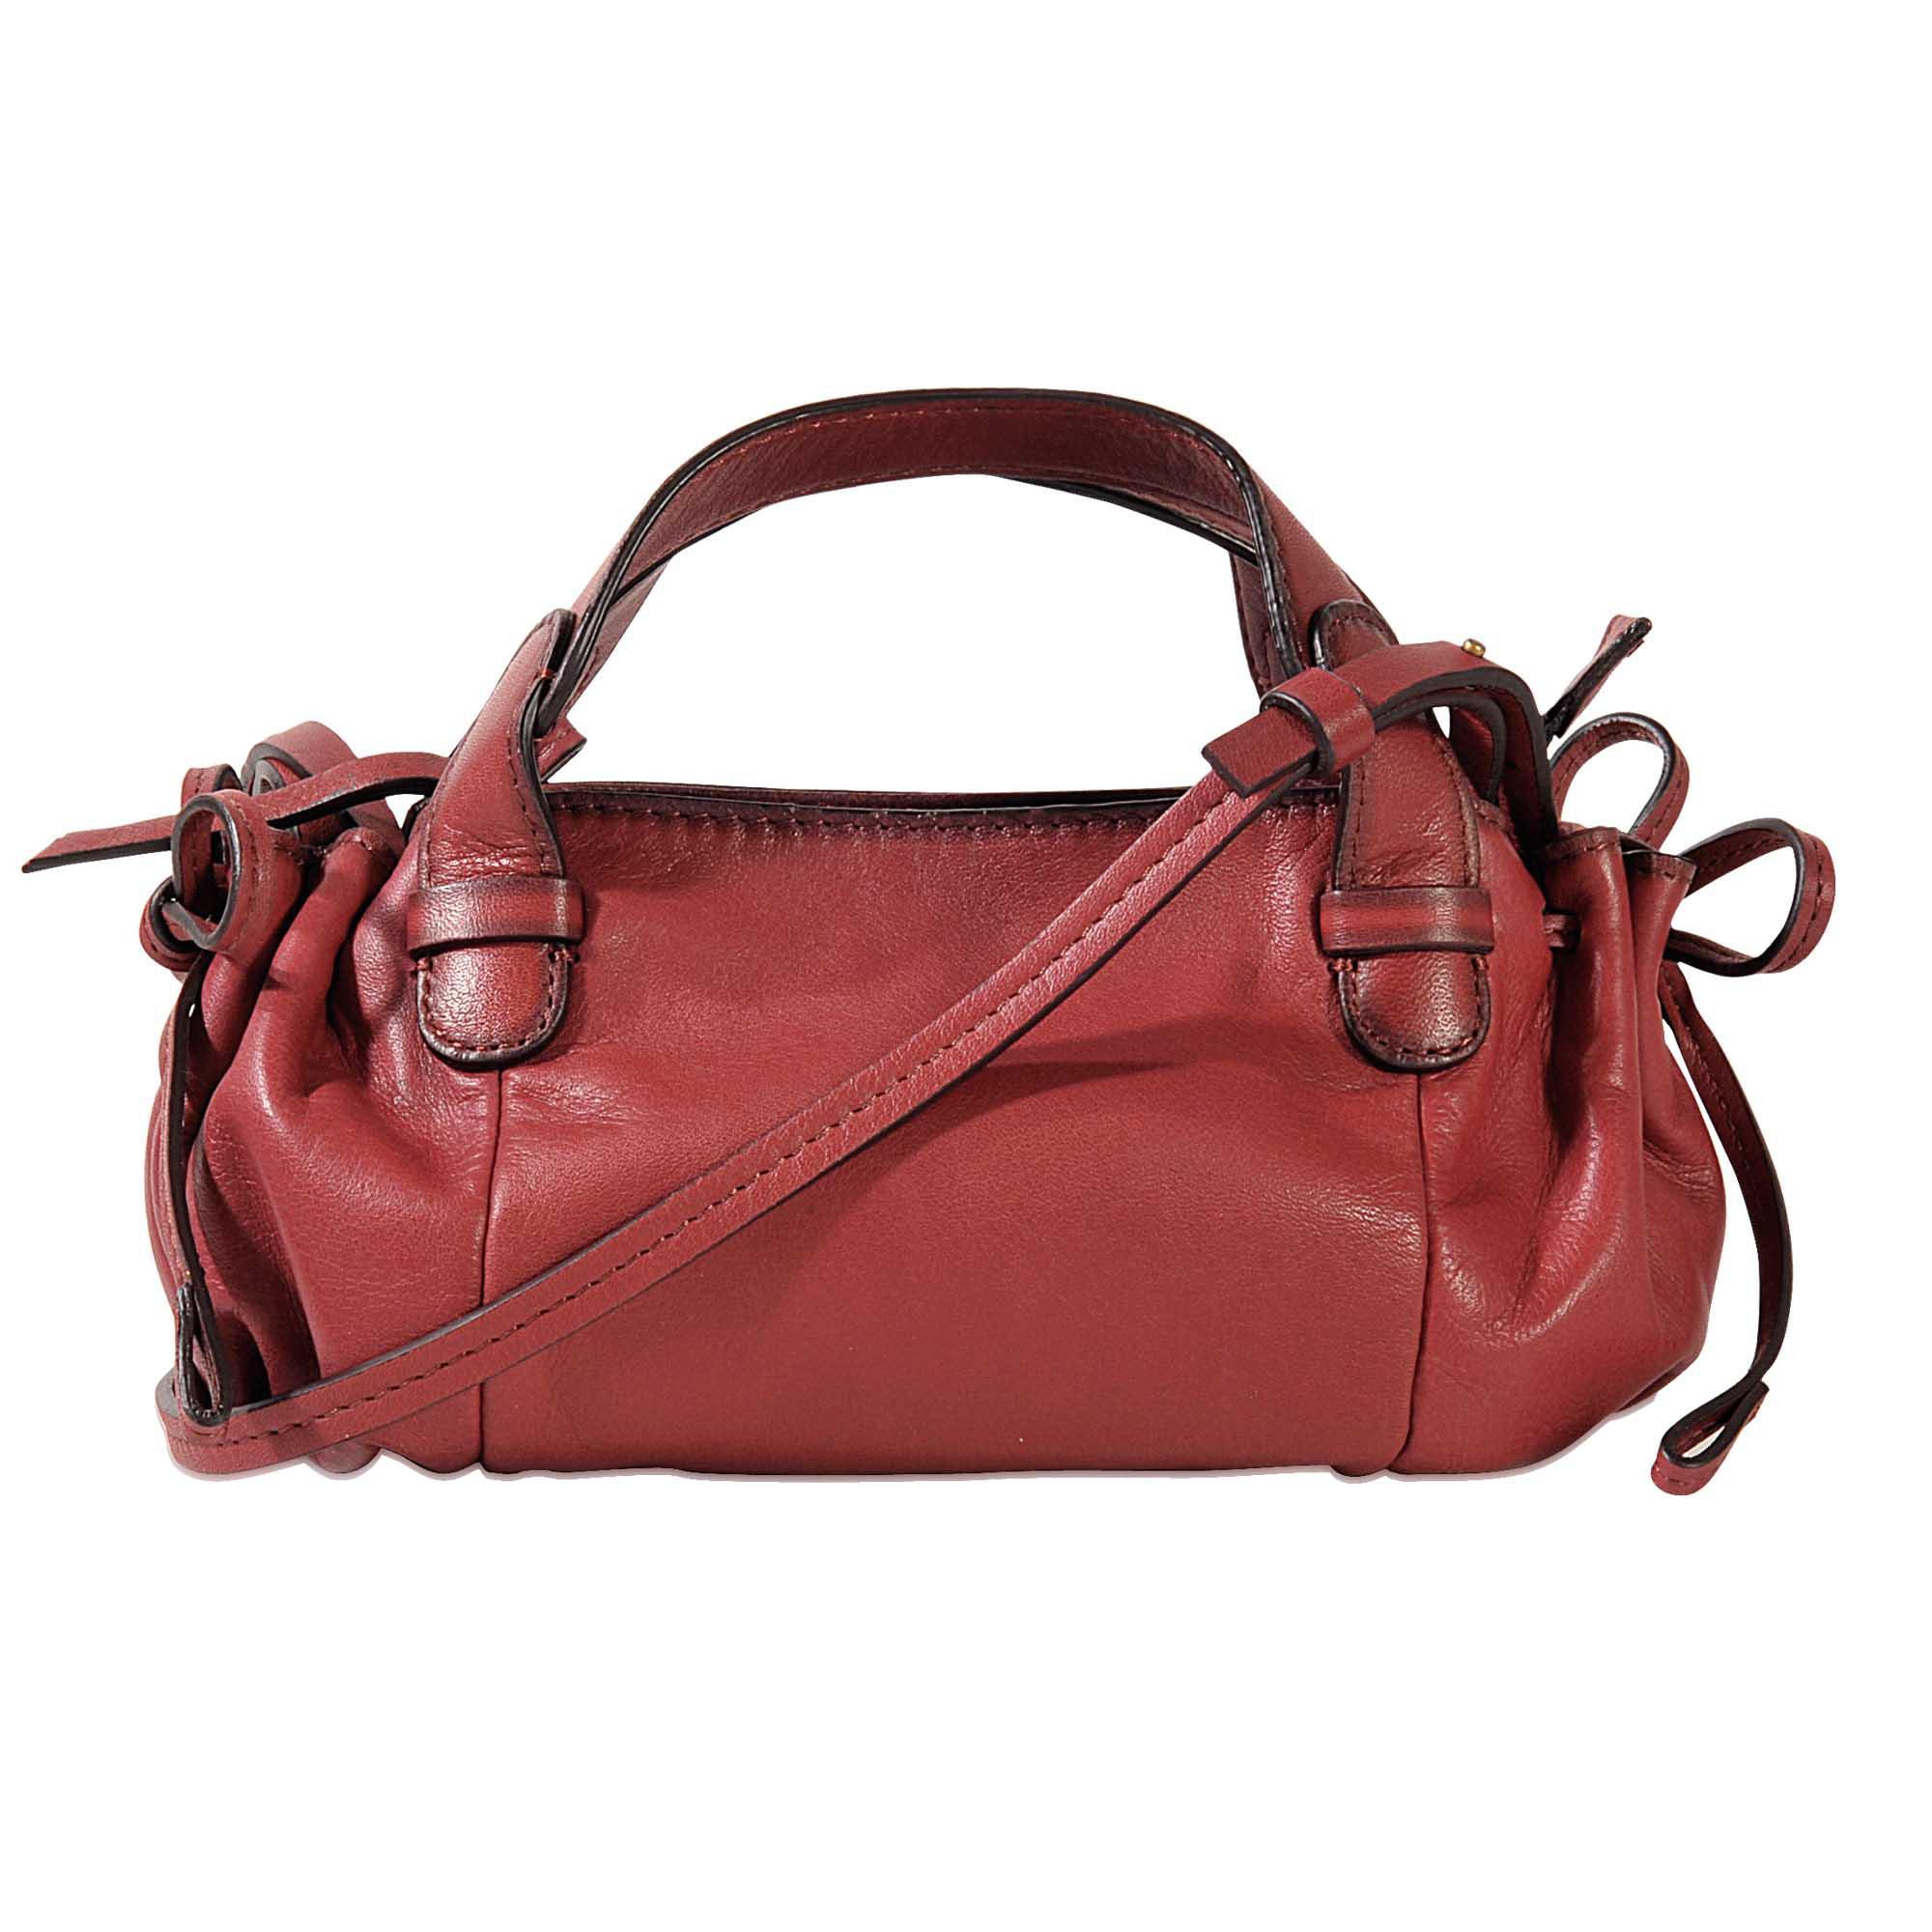 965b8b320af Lyst - Gerard Darel Micro Gd Bag in Brown